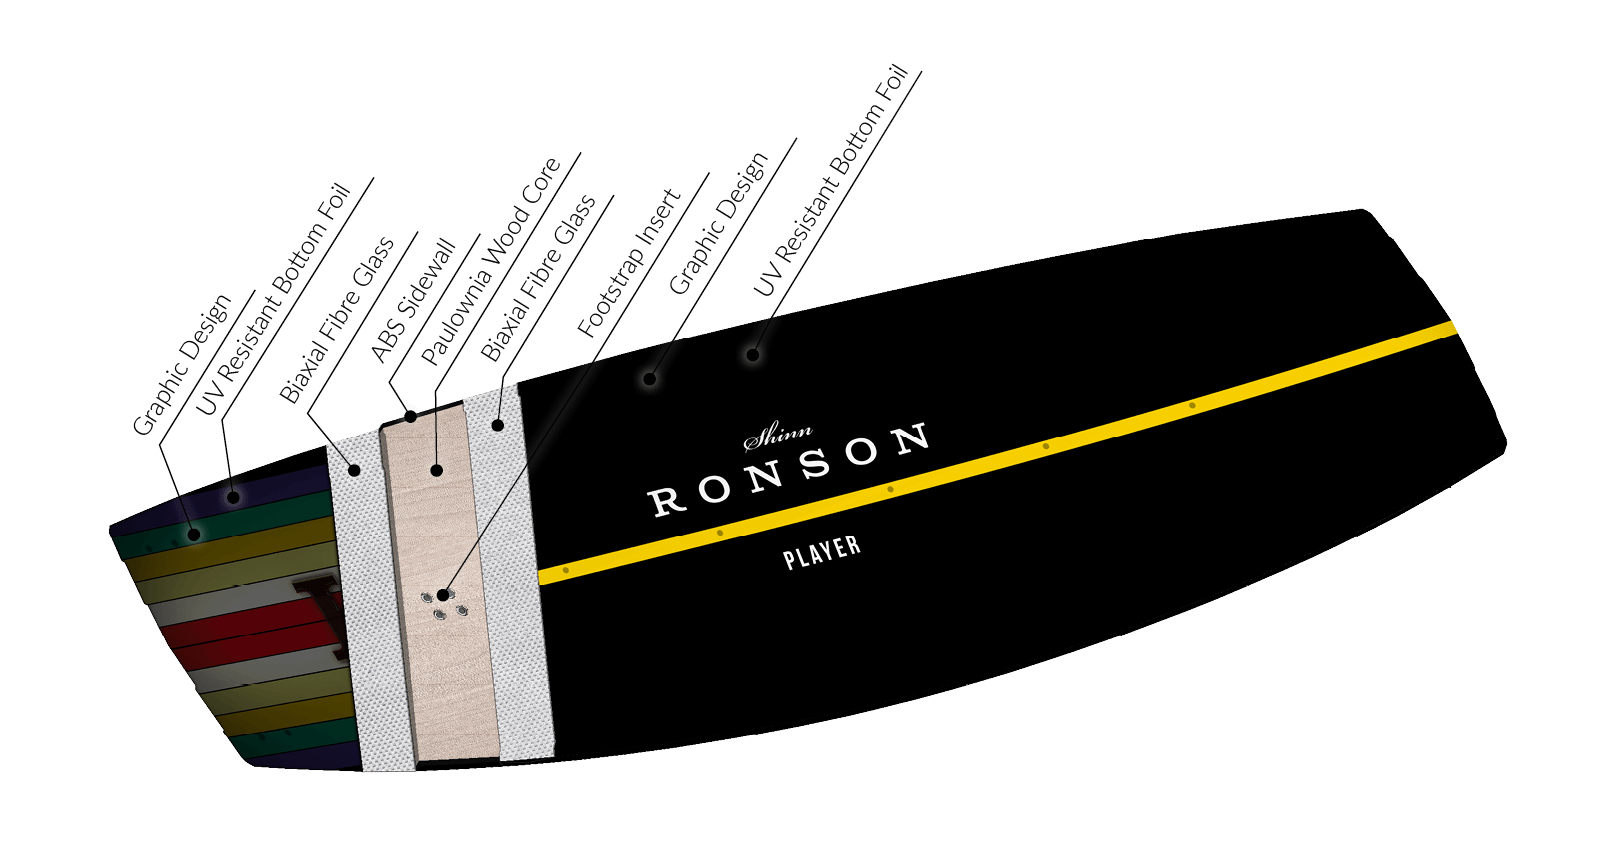 Kaito lenta Shinn Ronson Player